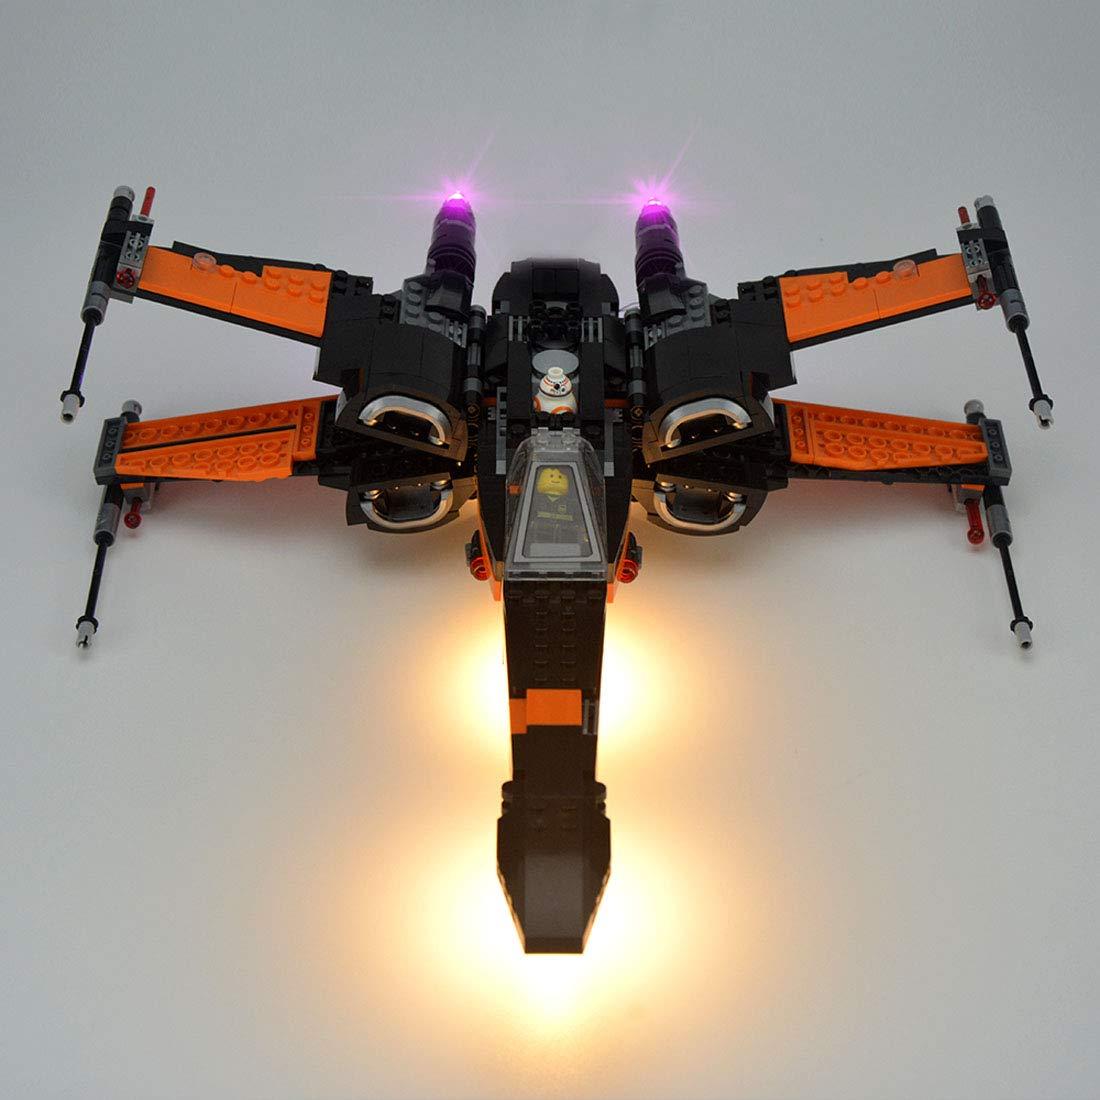 TLJ Poe's X-Wing Fighter Lighting Lego set 1